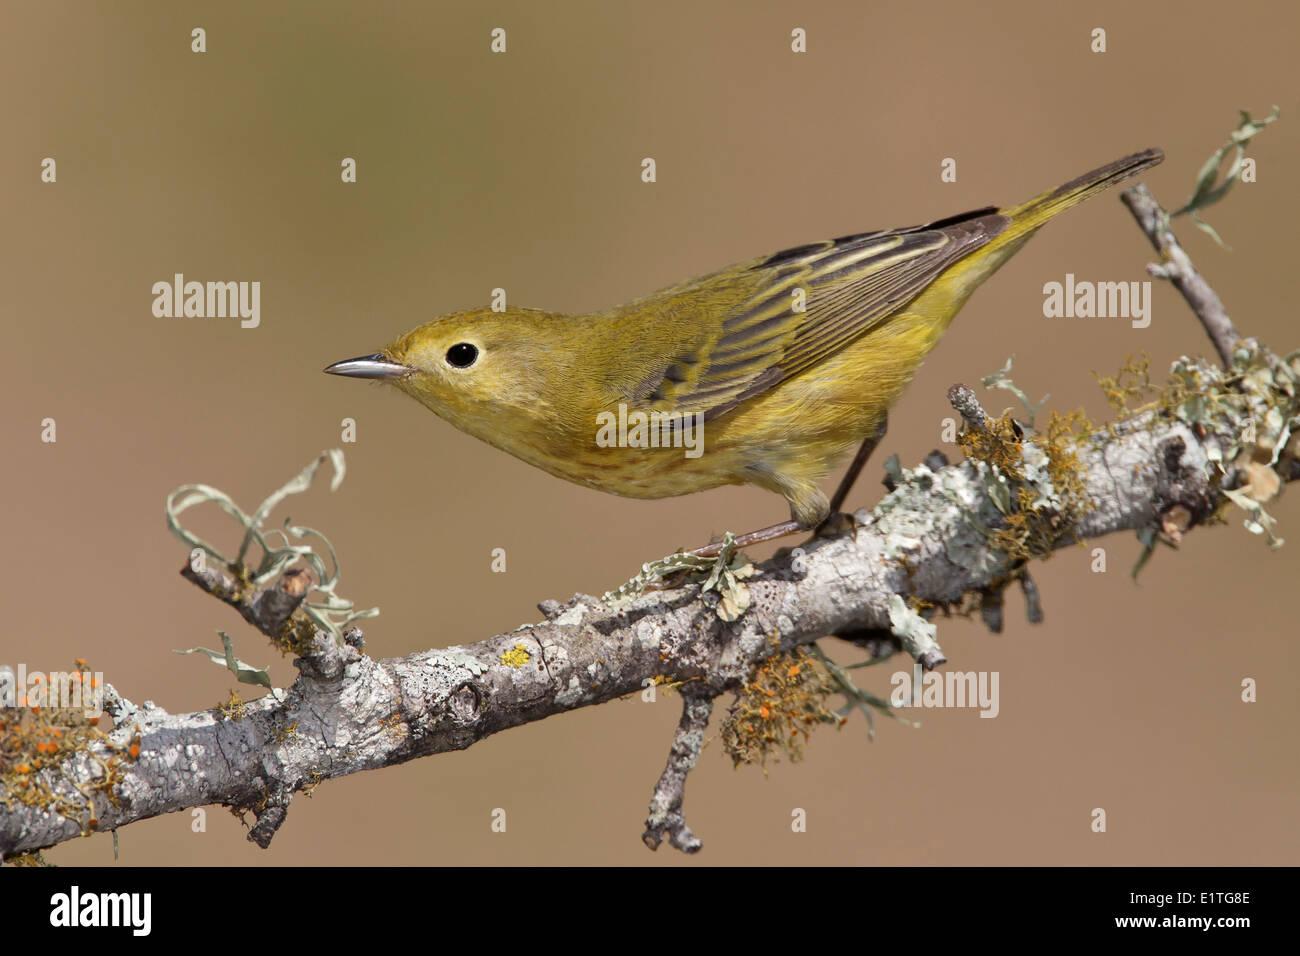 American Yellow Warbler - Setophaga petechia - Adult female Stock Photo